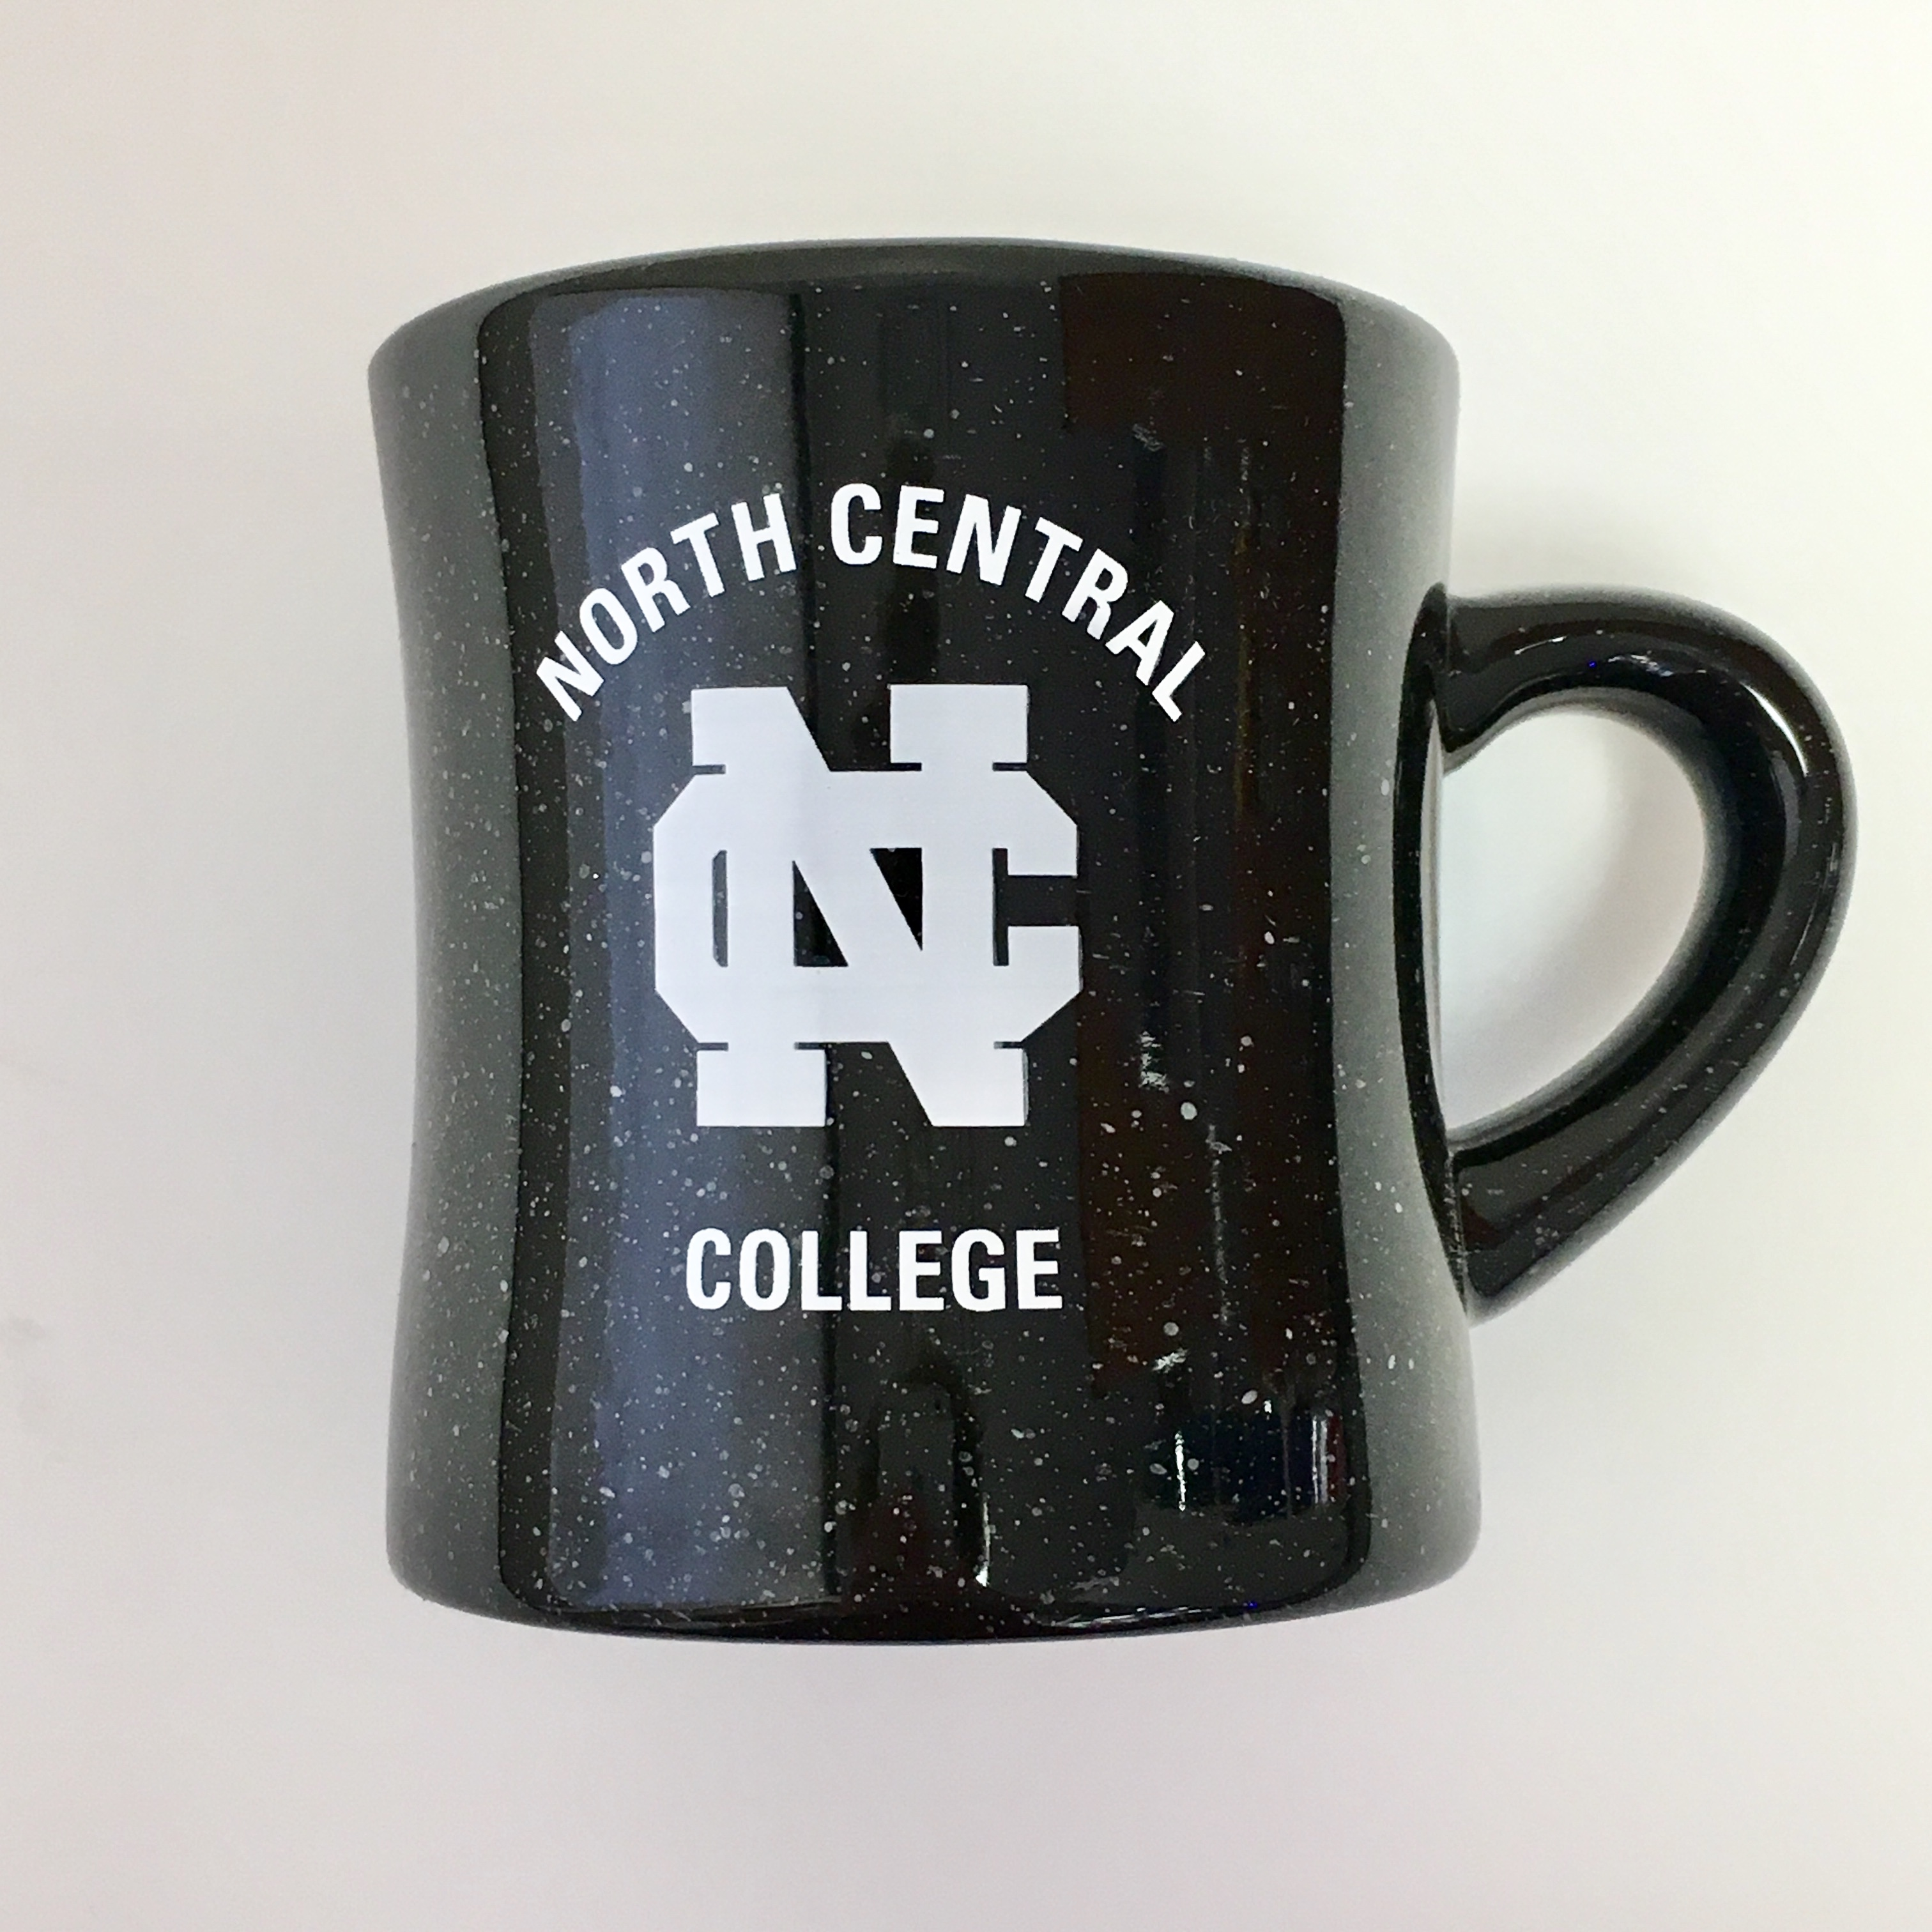 Image for the Santa Fe Mug product